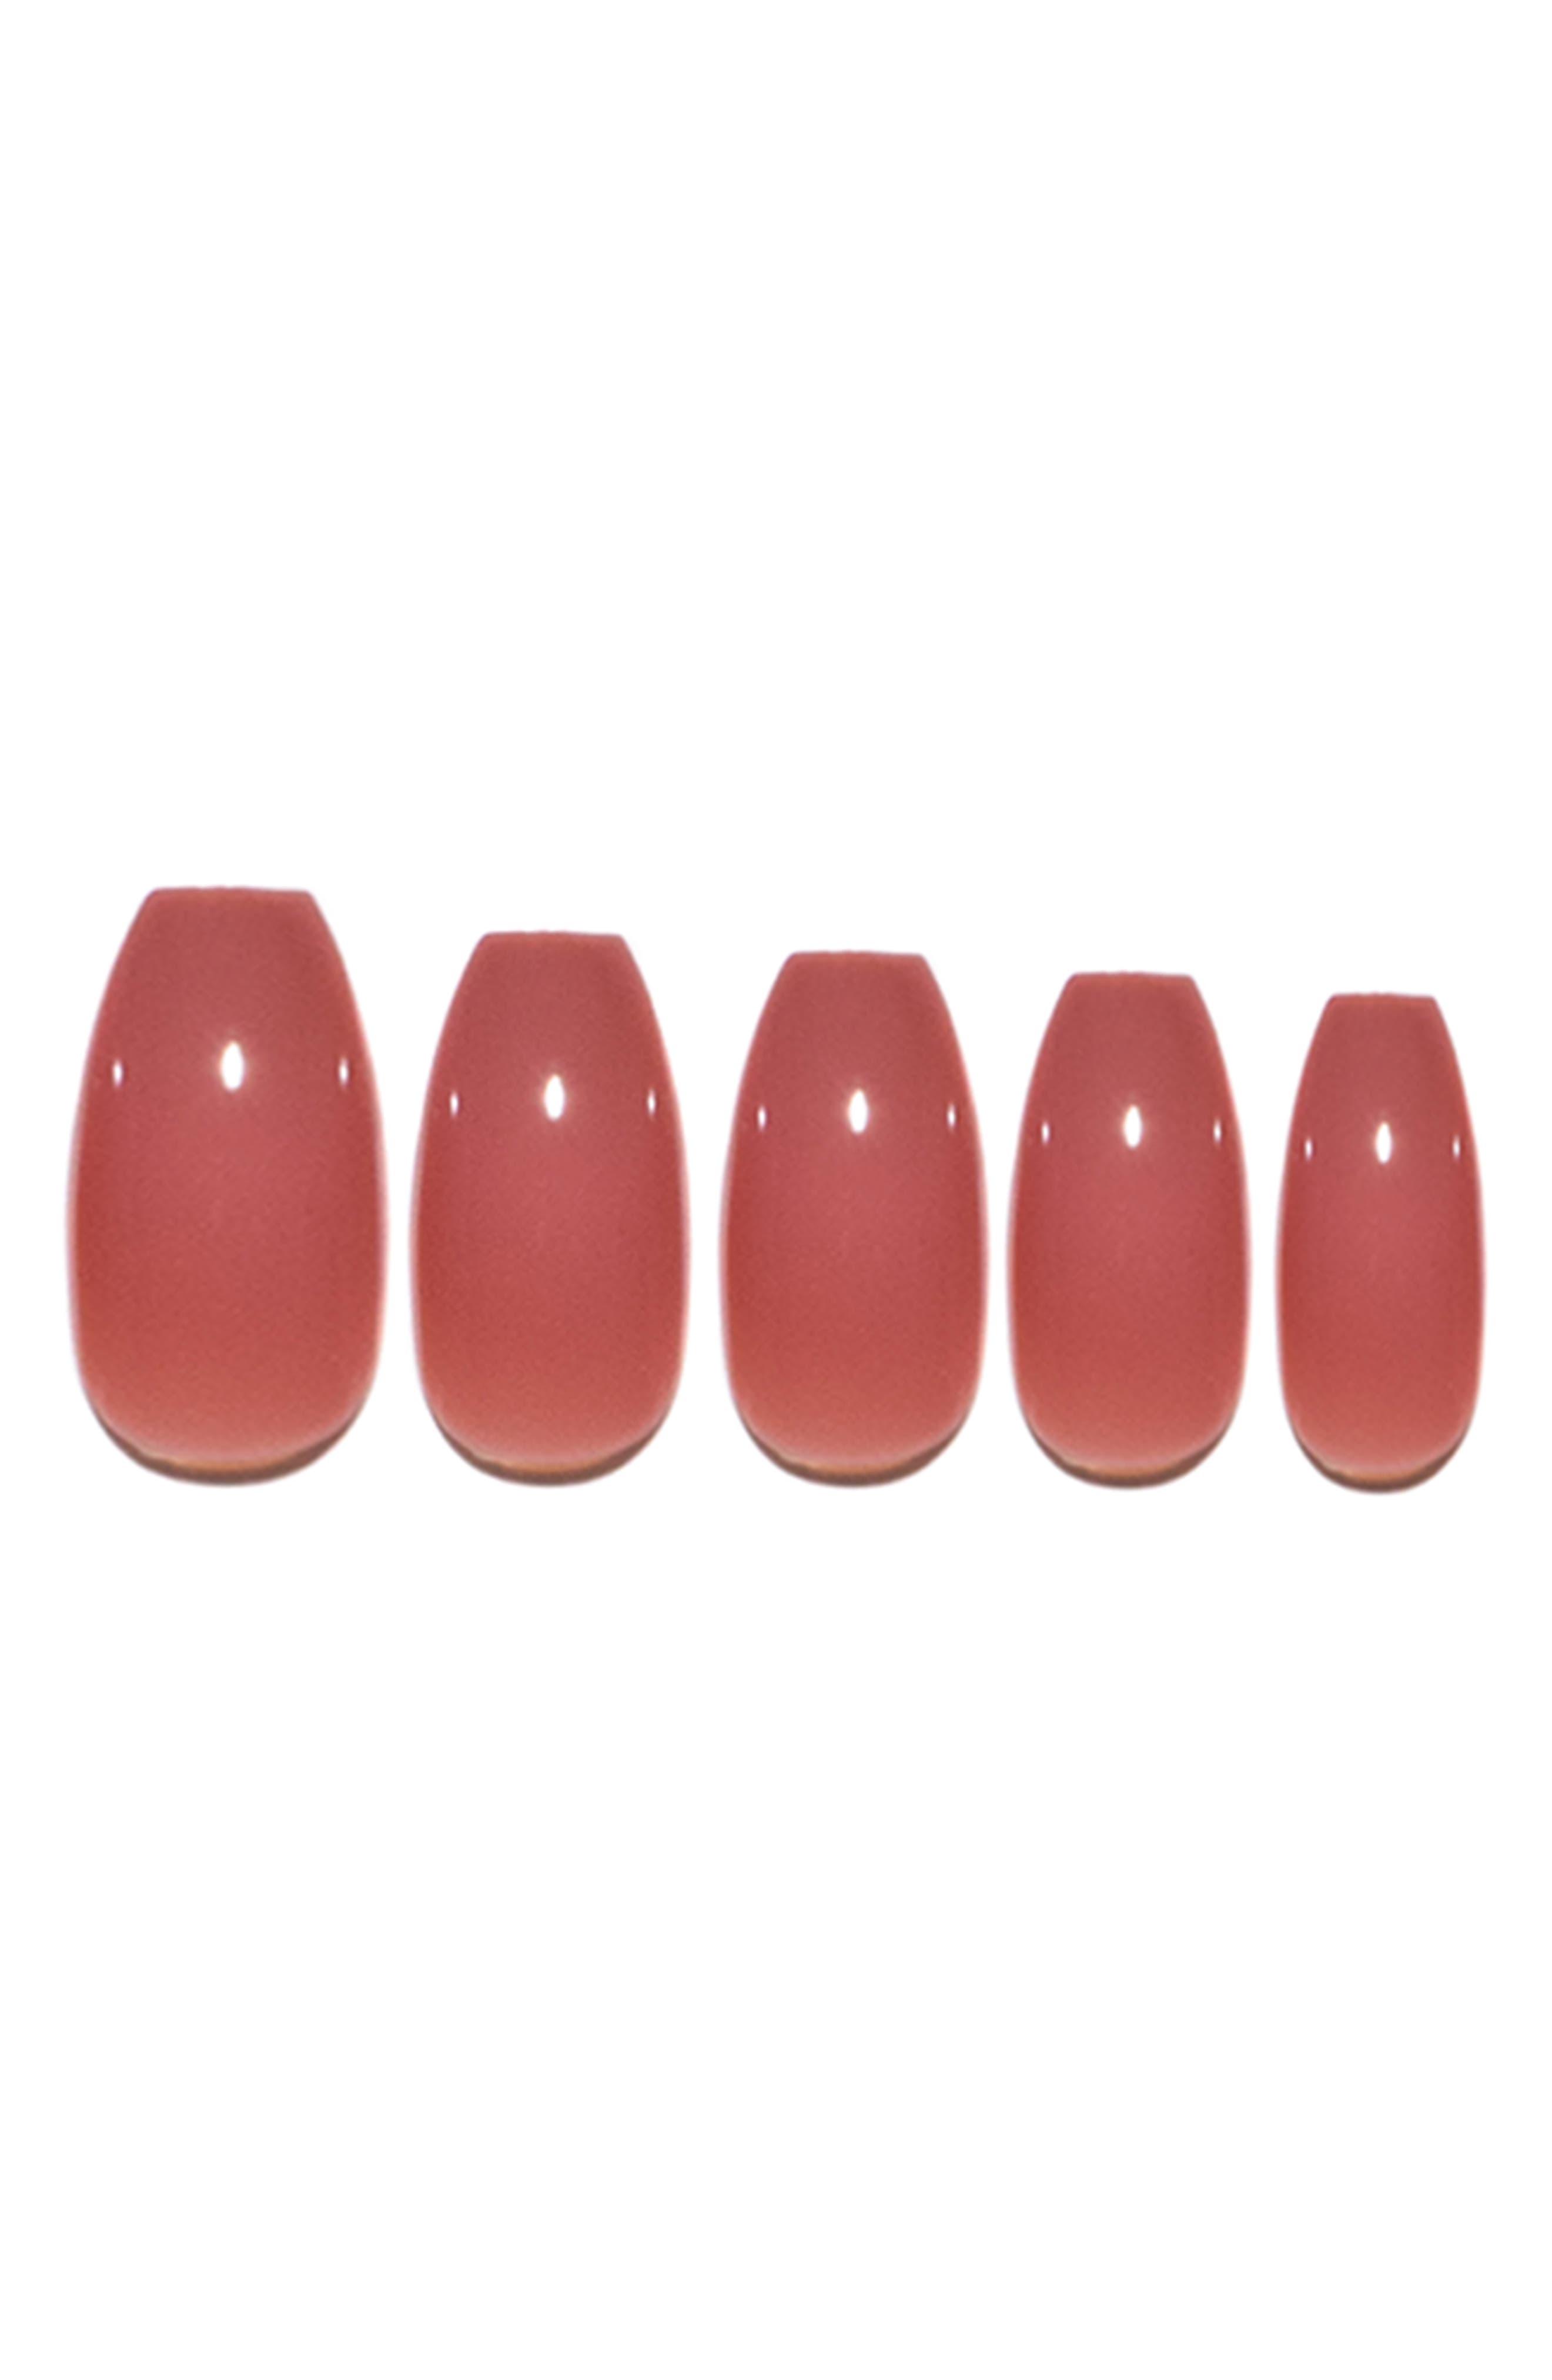 Dusty Rose Pop-On Reusable Manicure Set,                             Main thumbnail 1, color,                             DUSTY ROSE